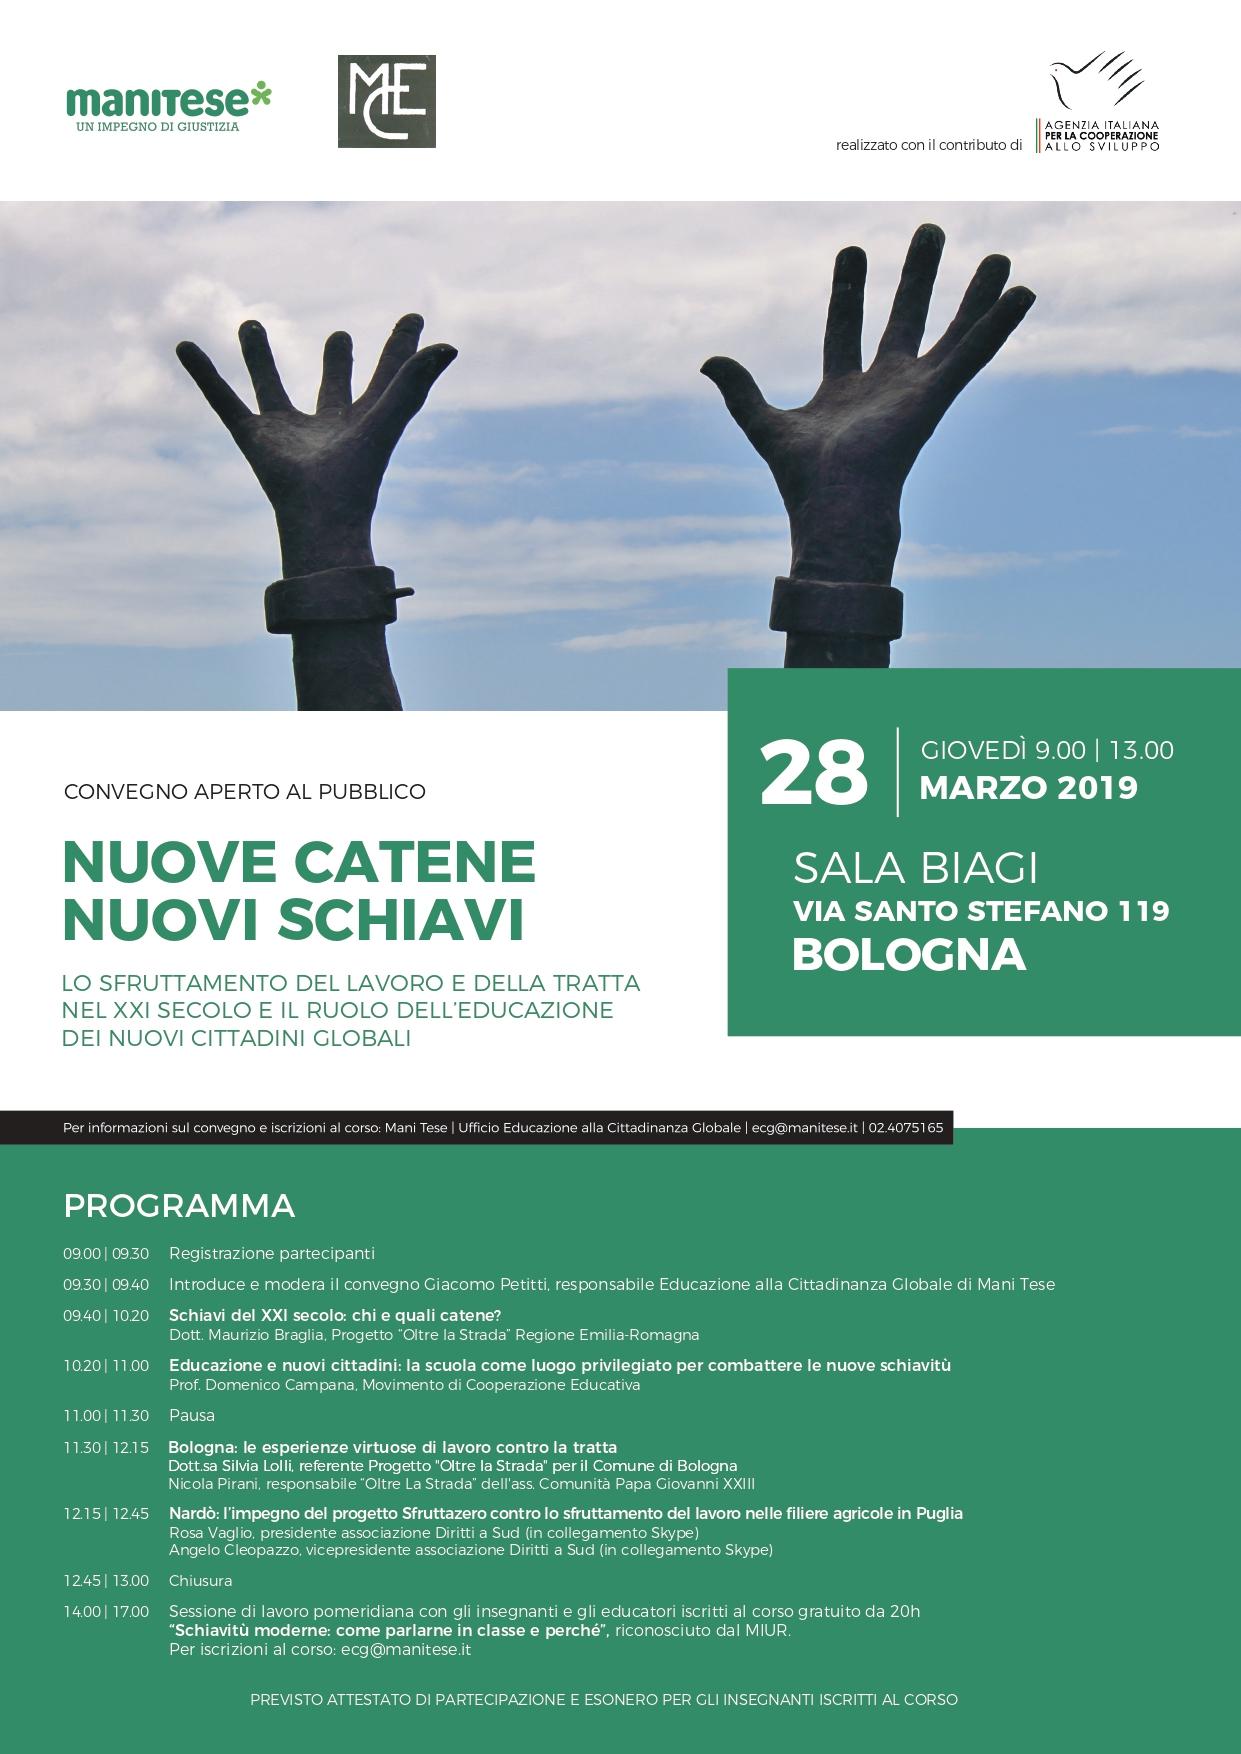 locandina_convegno_schiavitu_moderne_A4_Bologna mani tese 2019_page-0001